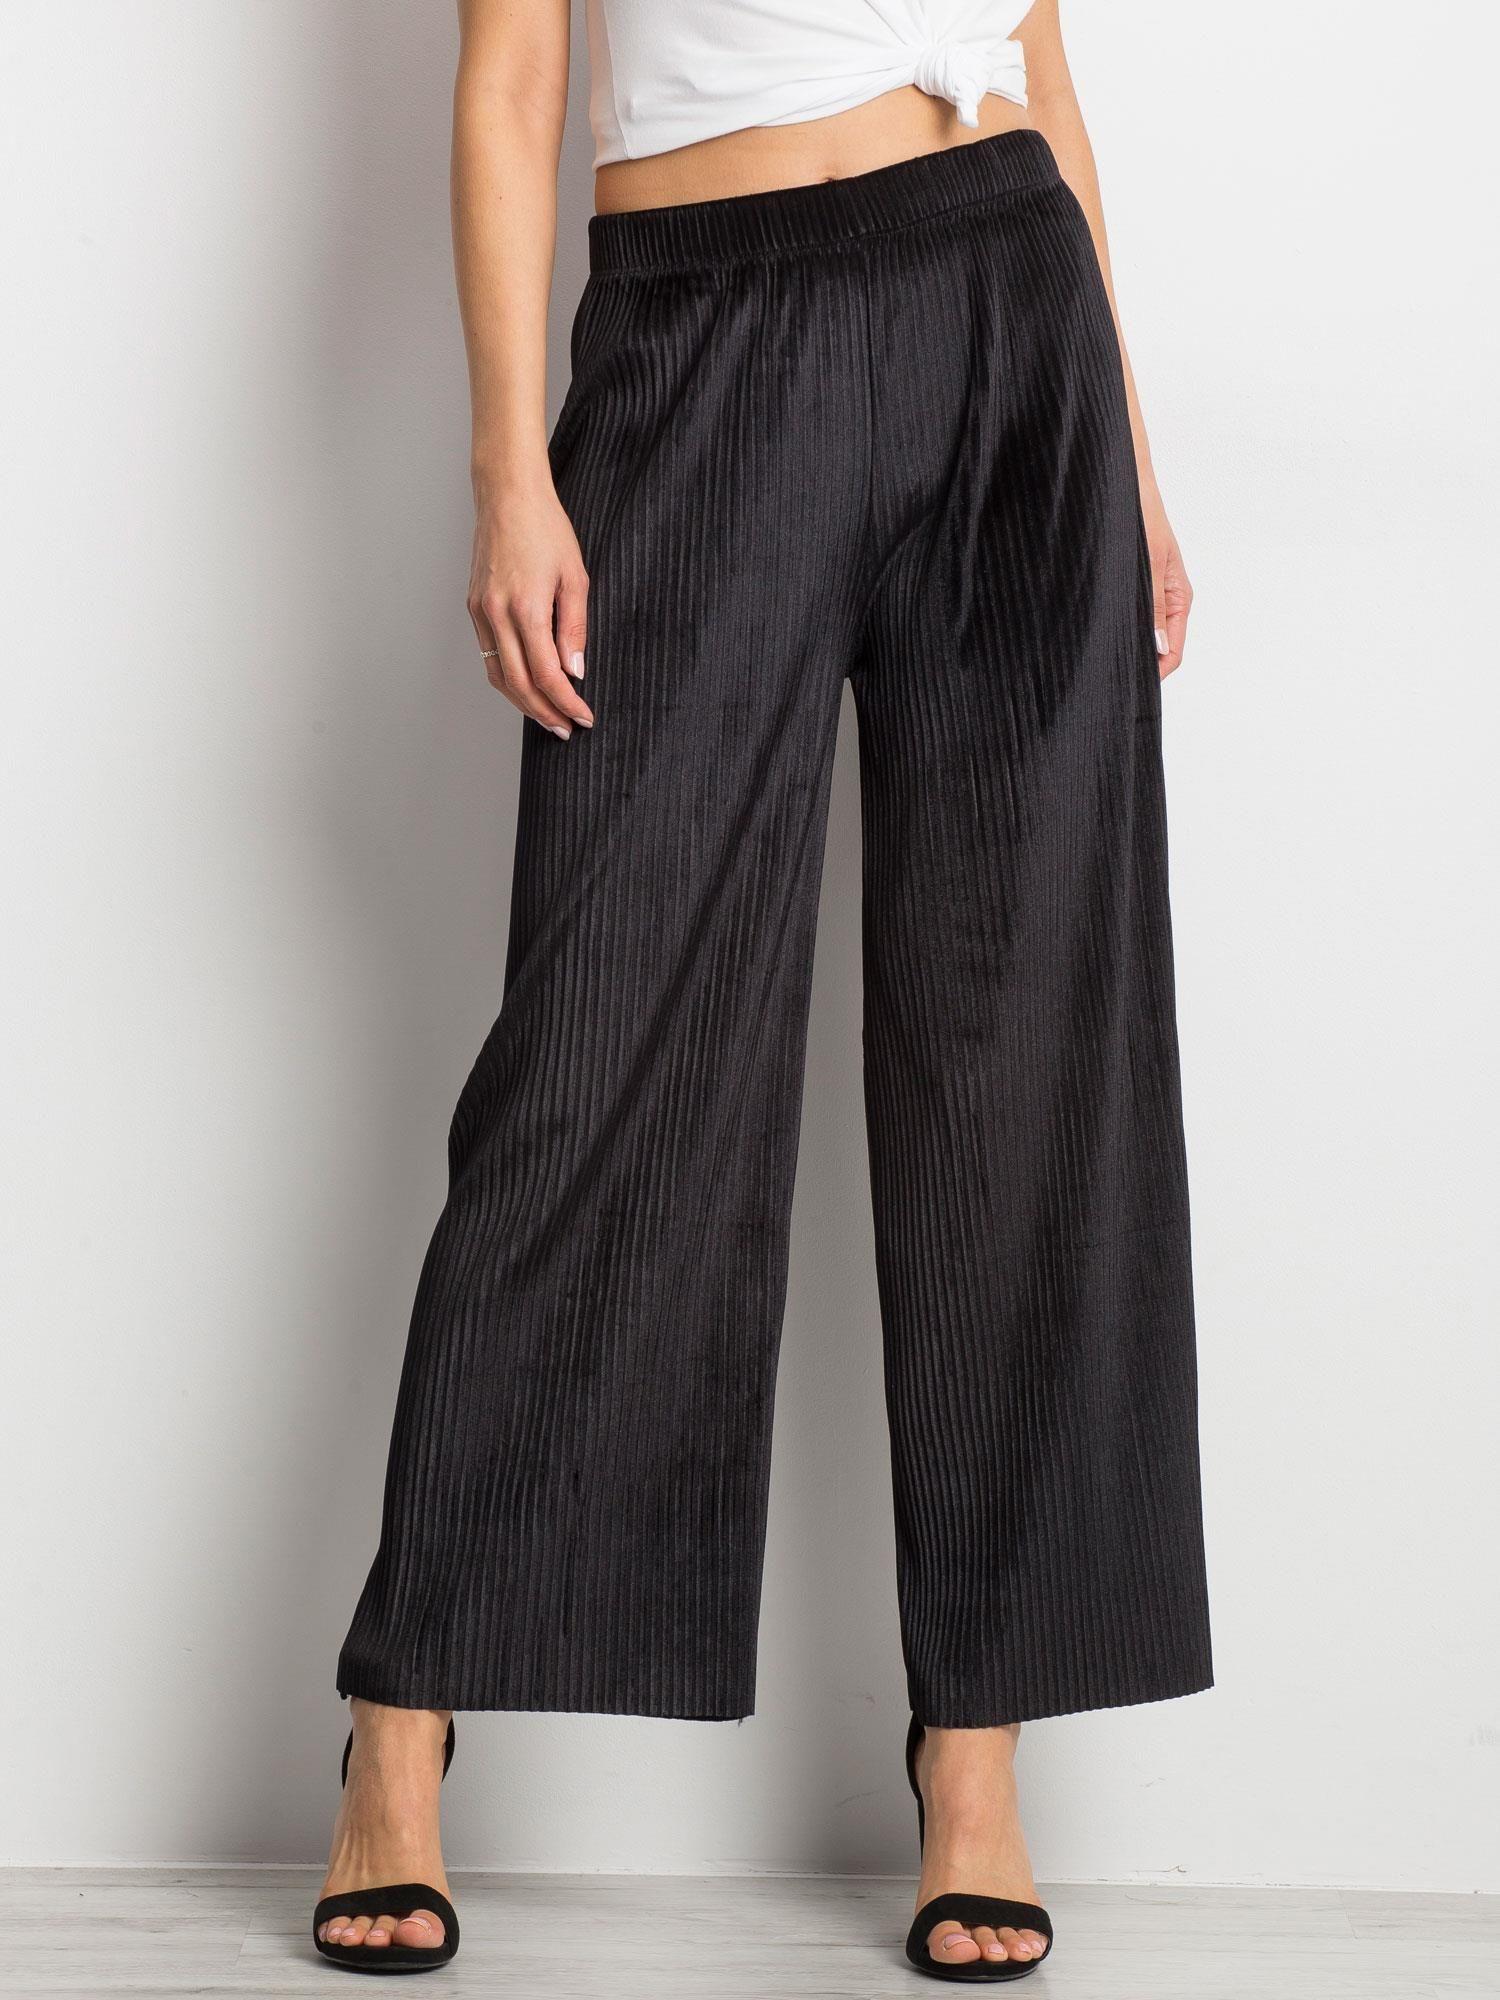 Čierne voľné rozšírené nohavice - XL